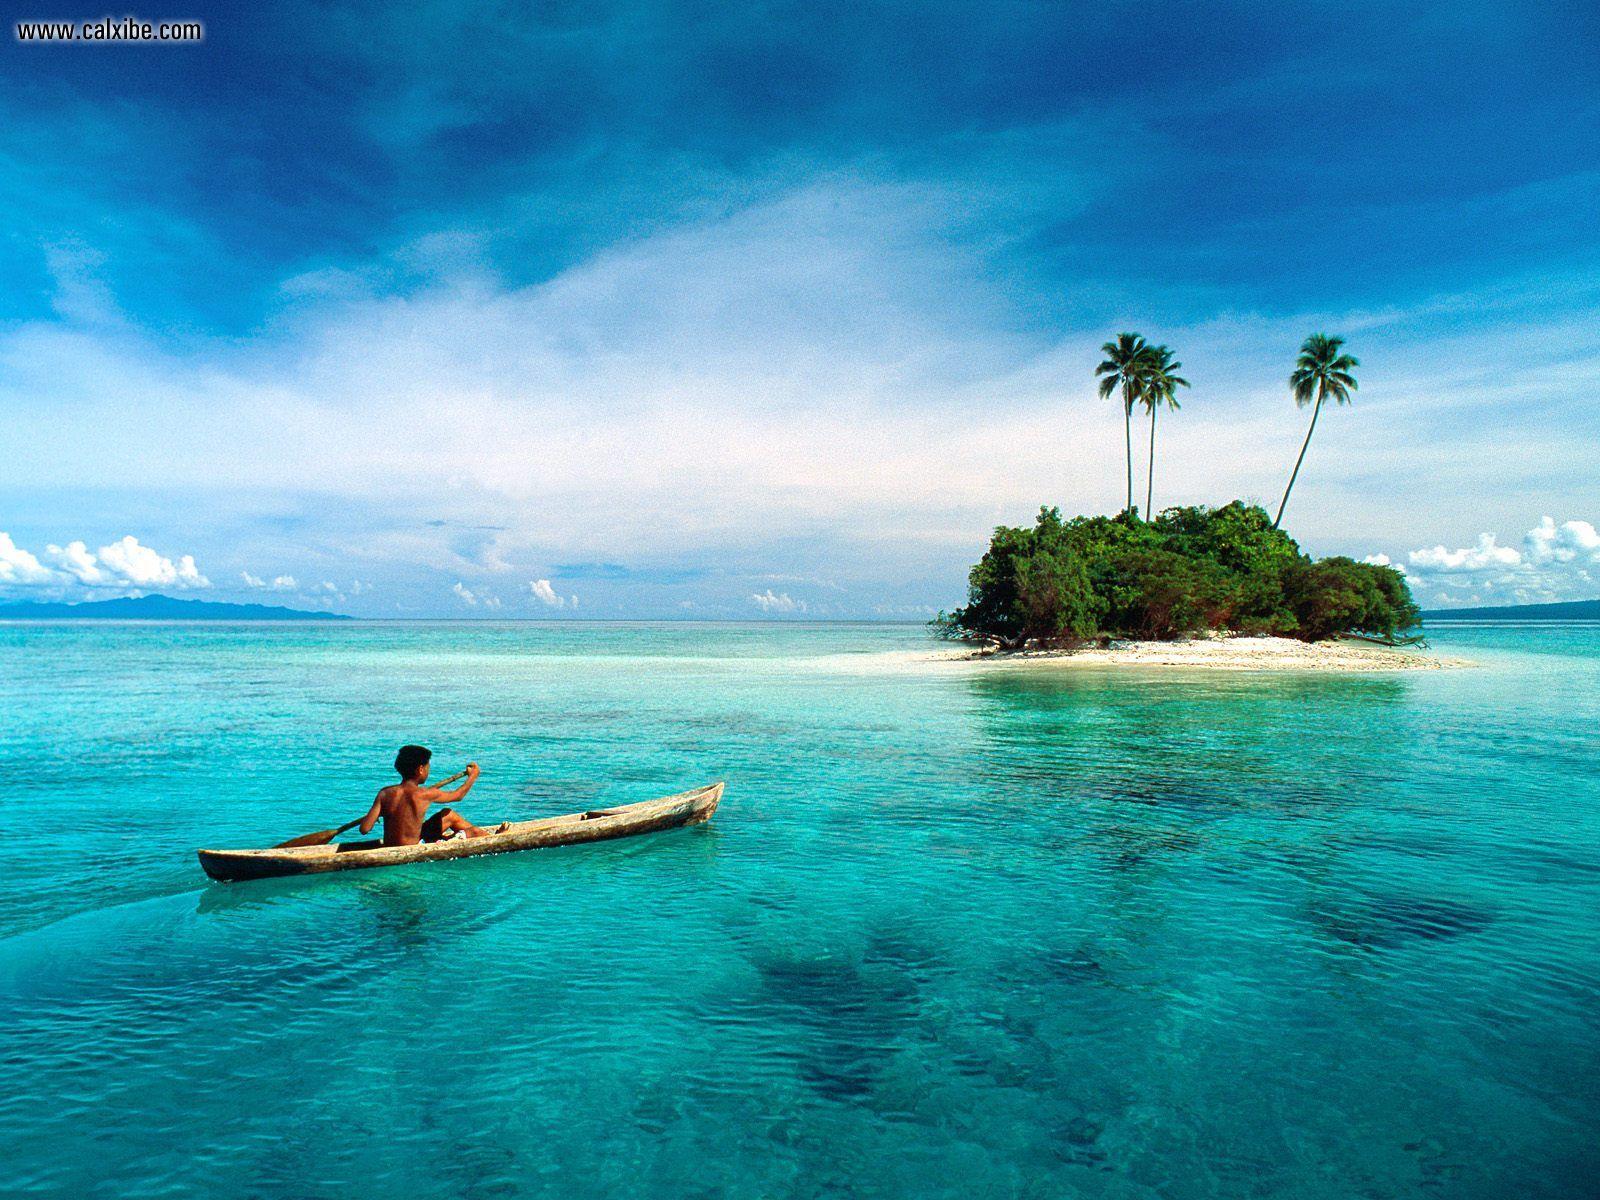 Solomon Island Wallpaper ImageBankbiz 1600x1200